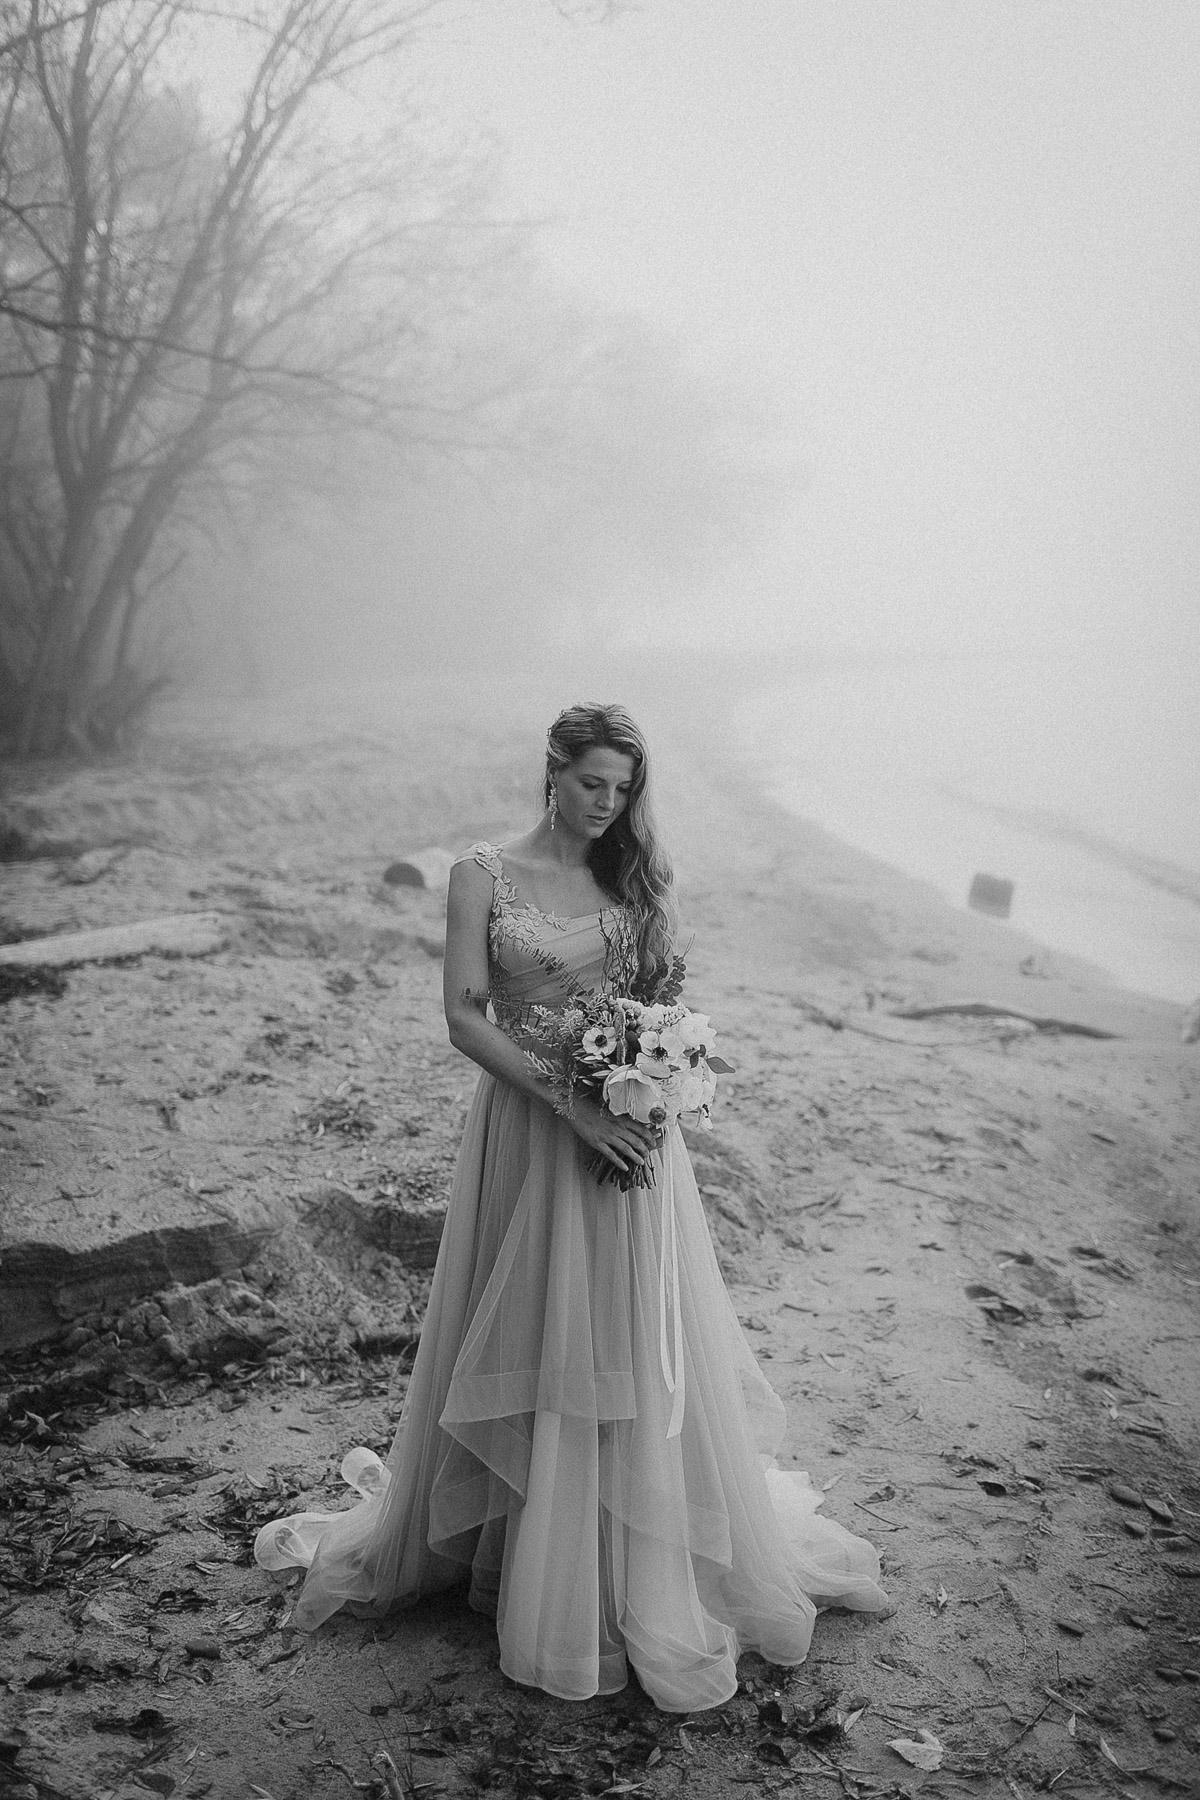 ballad-photography-vineyard-bride-swish-list-niagara-seaside-wedding-editorial-23.jpg